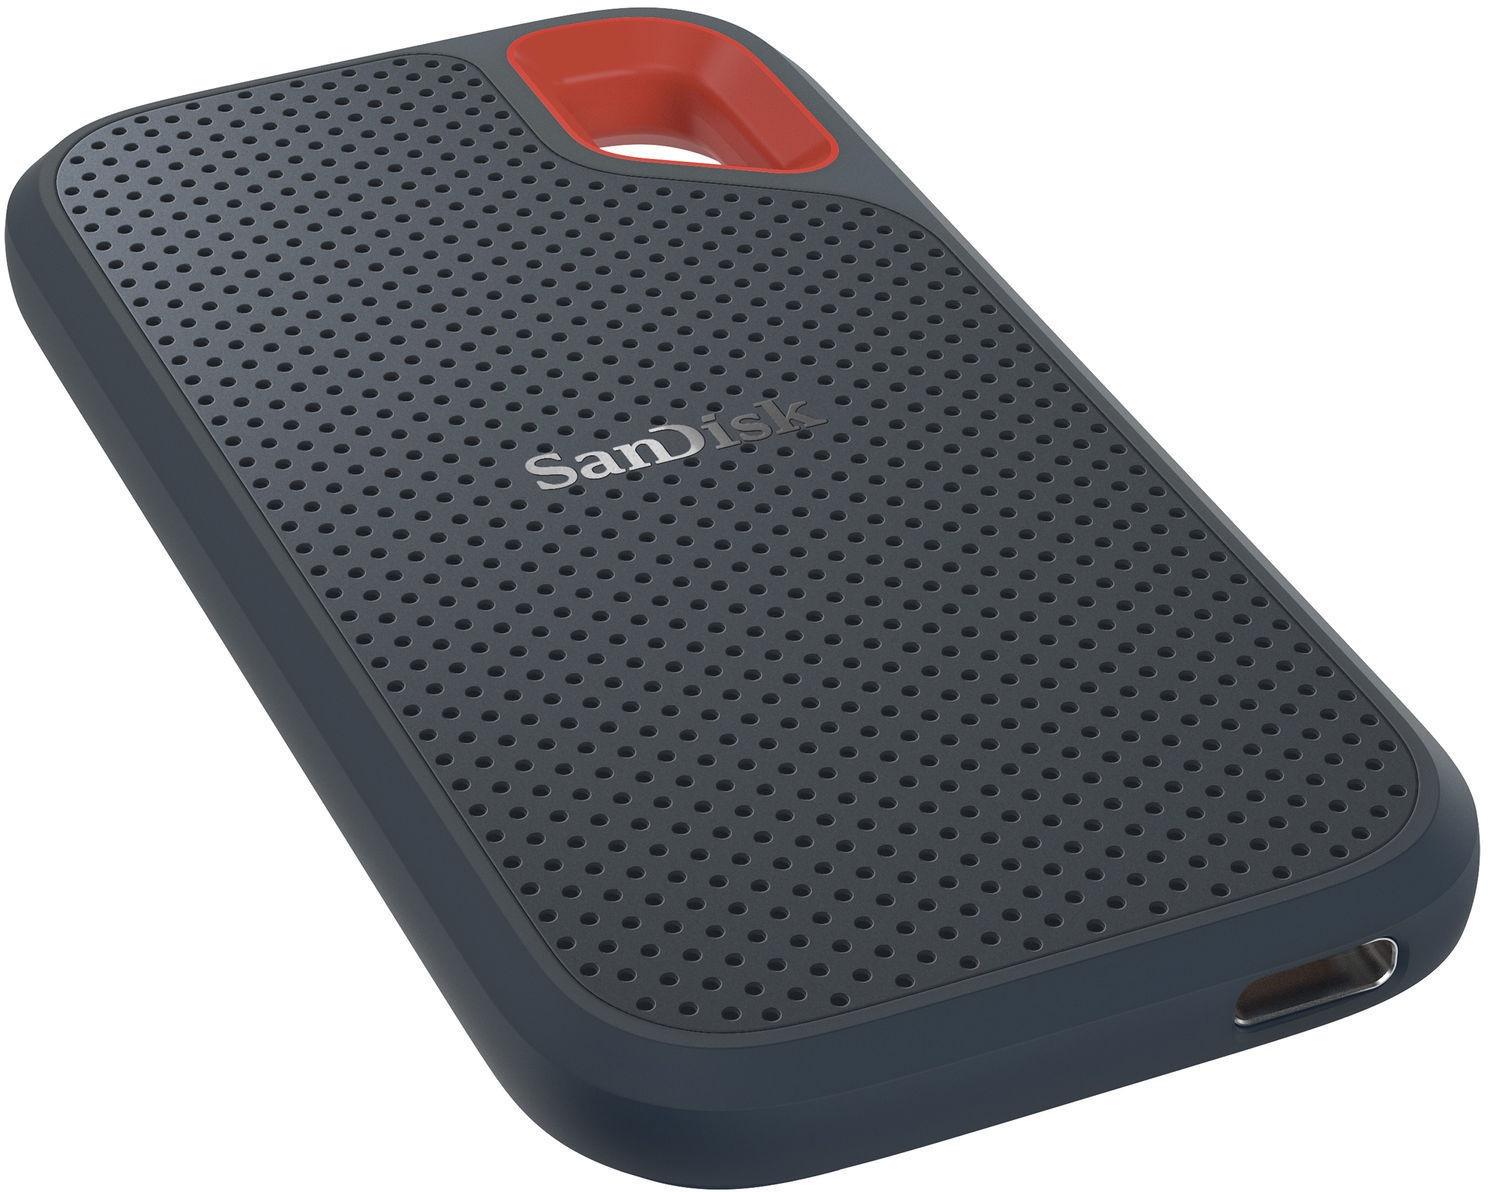 SanDisk Extreme Portable SSD 2TB SDSSDE60-2T00-G25 - Senukai.lt